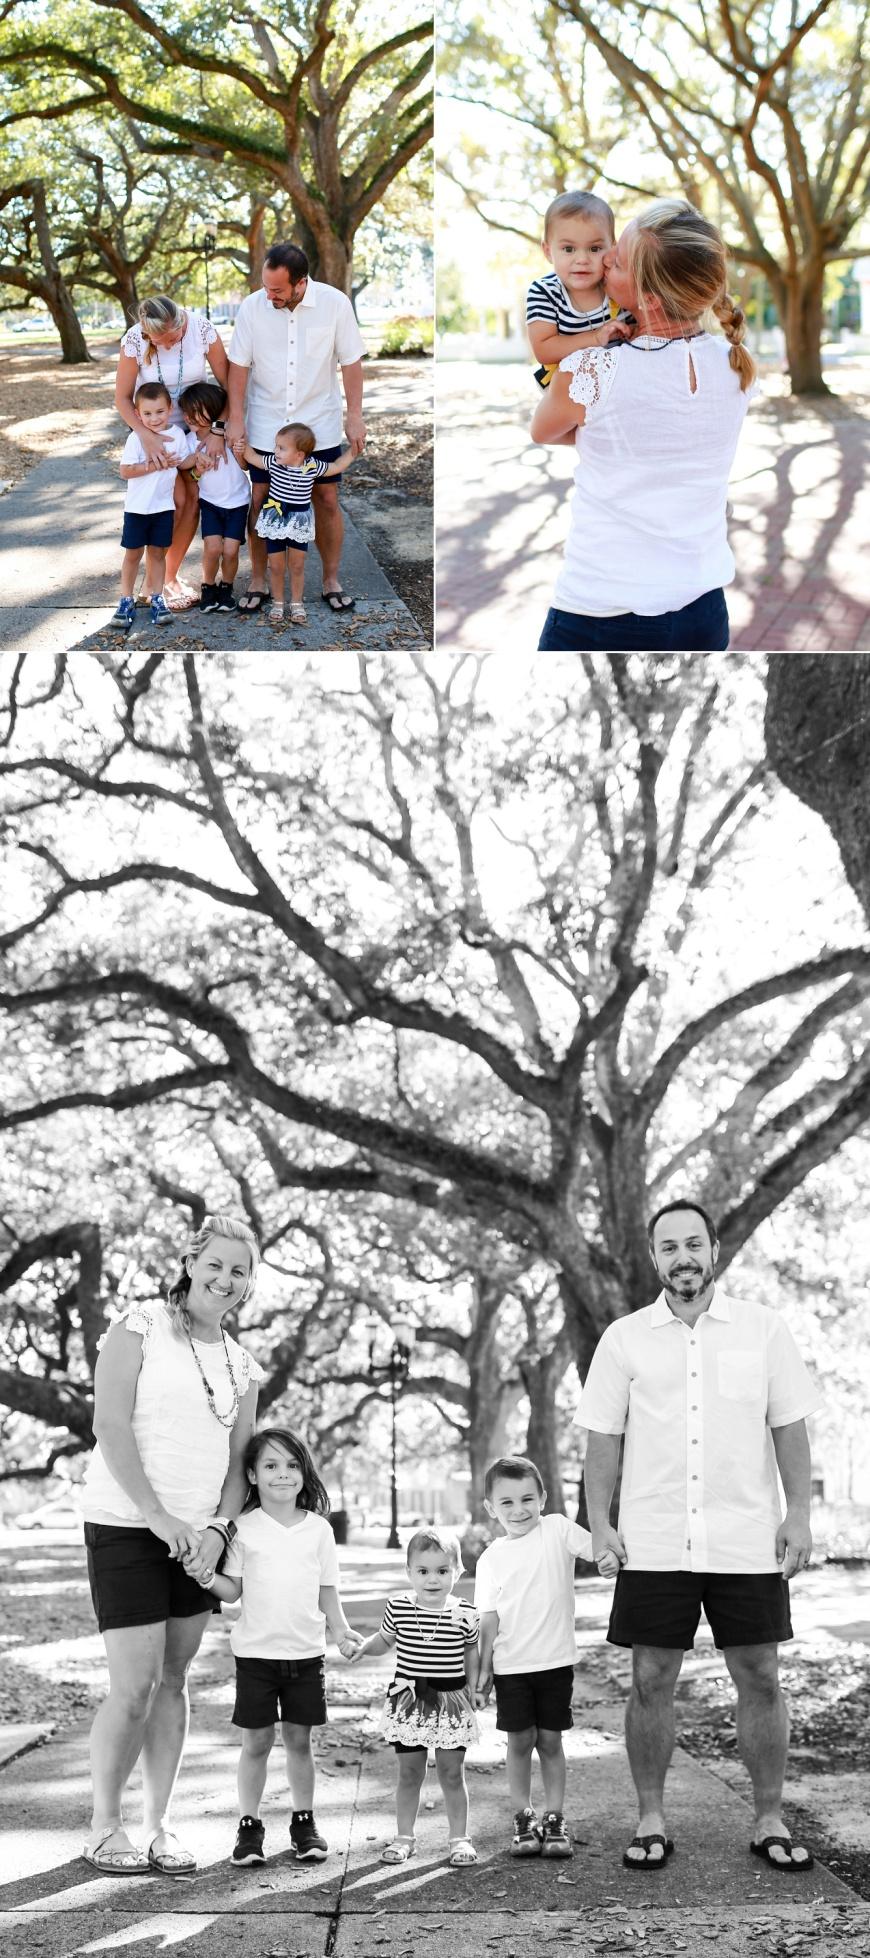 Seville-Square-Pensacola-Florida-Family-Photographer_1003.jpg